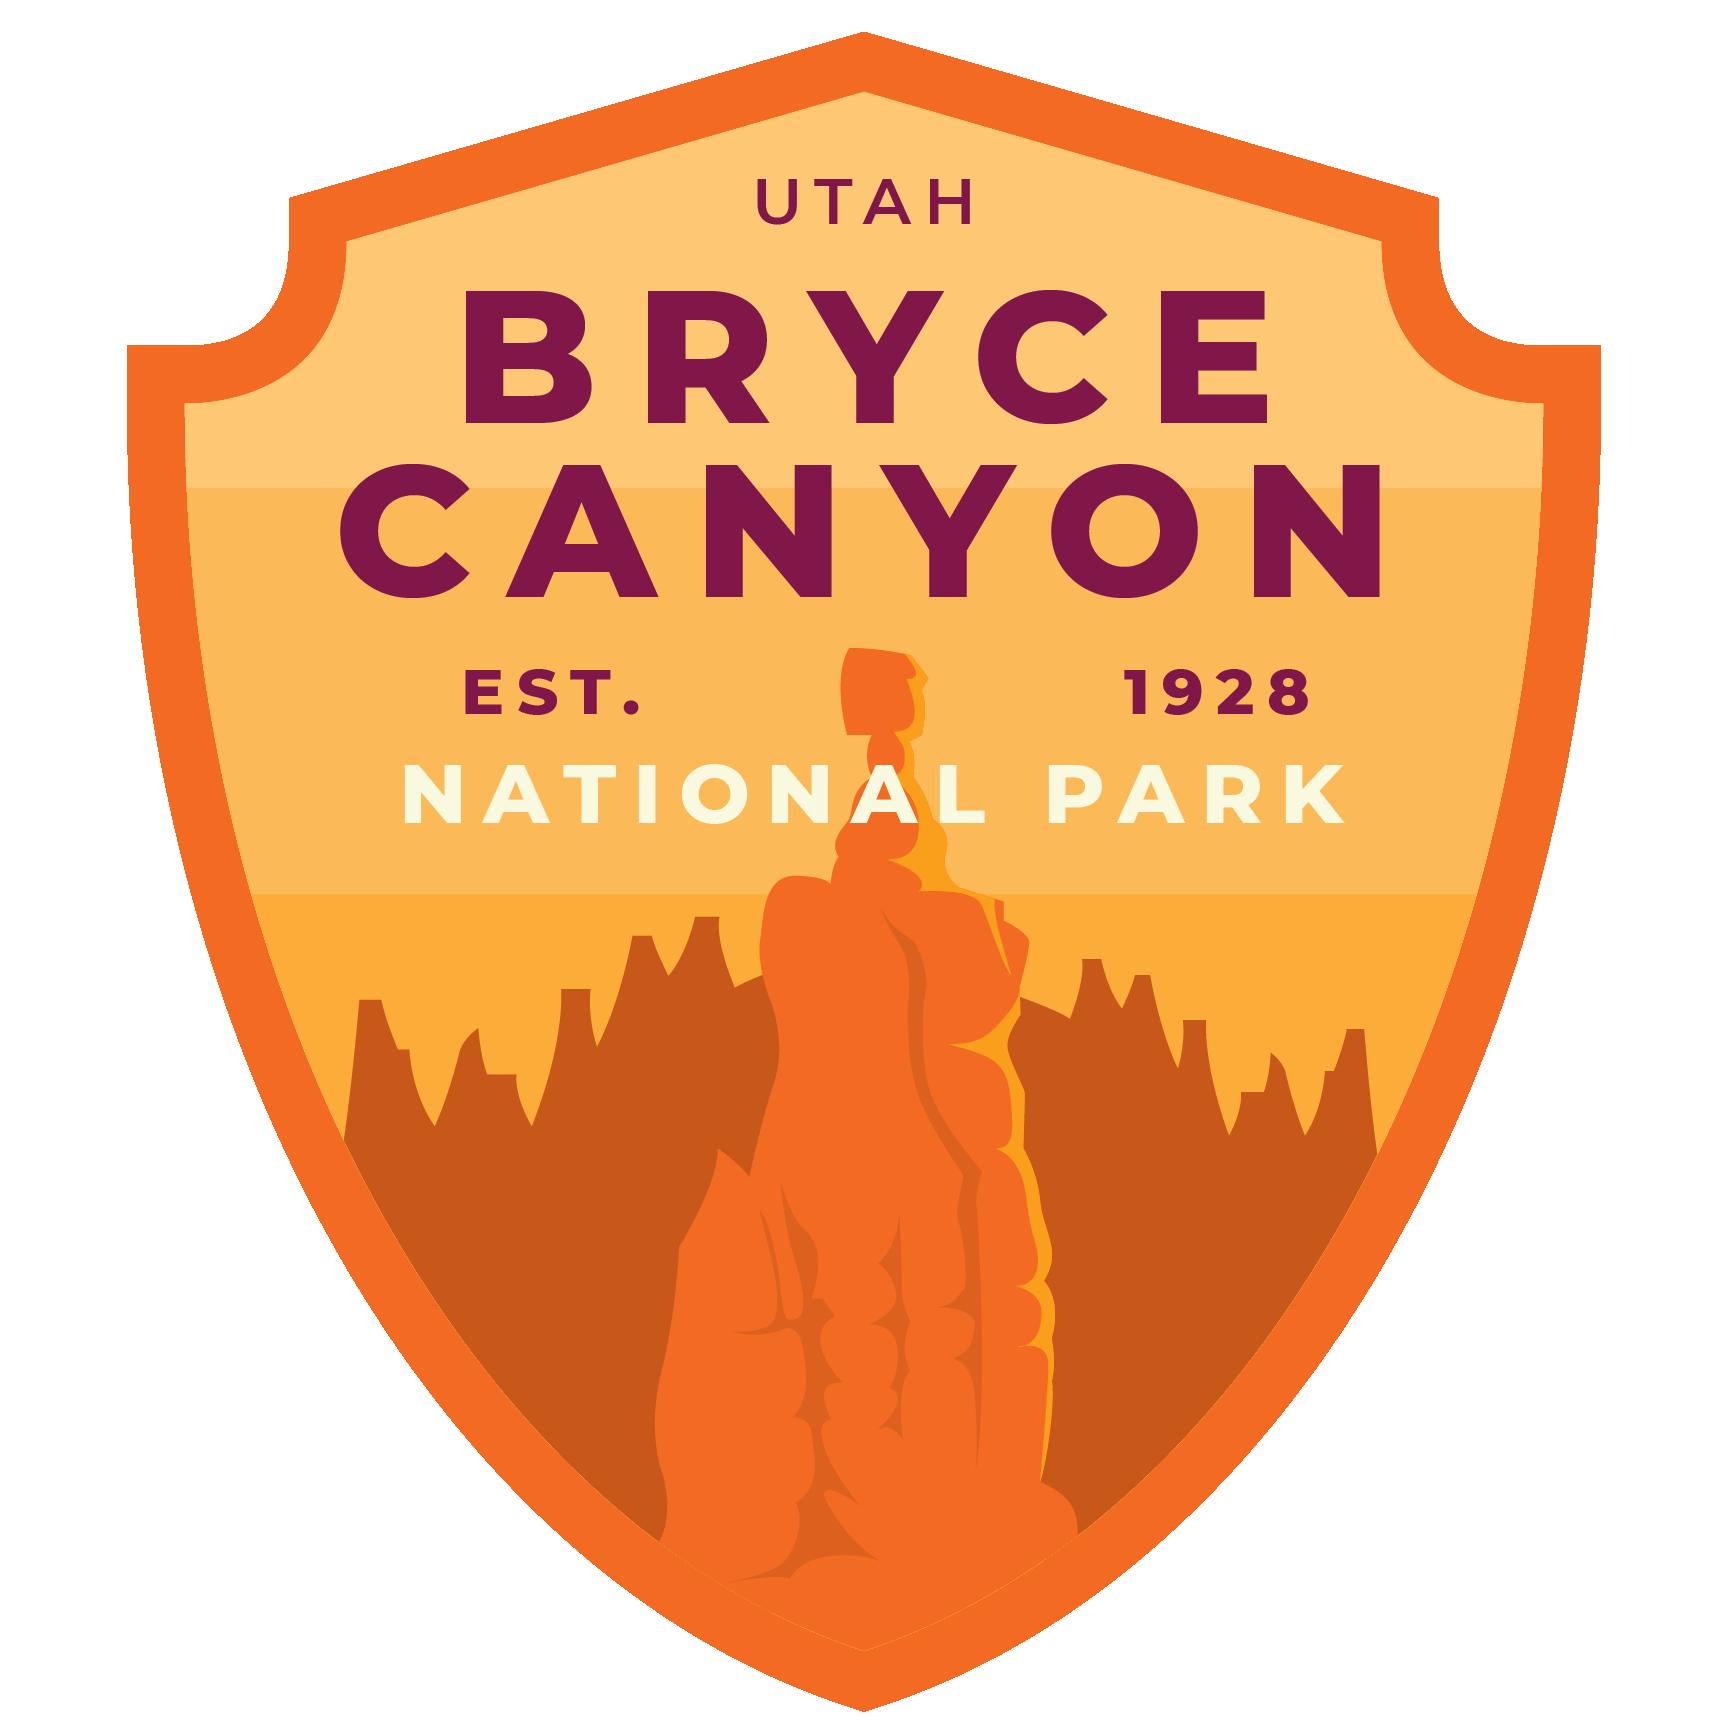 Bryce Canyon Vinyl Sticker Bryce canyon, National park